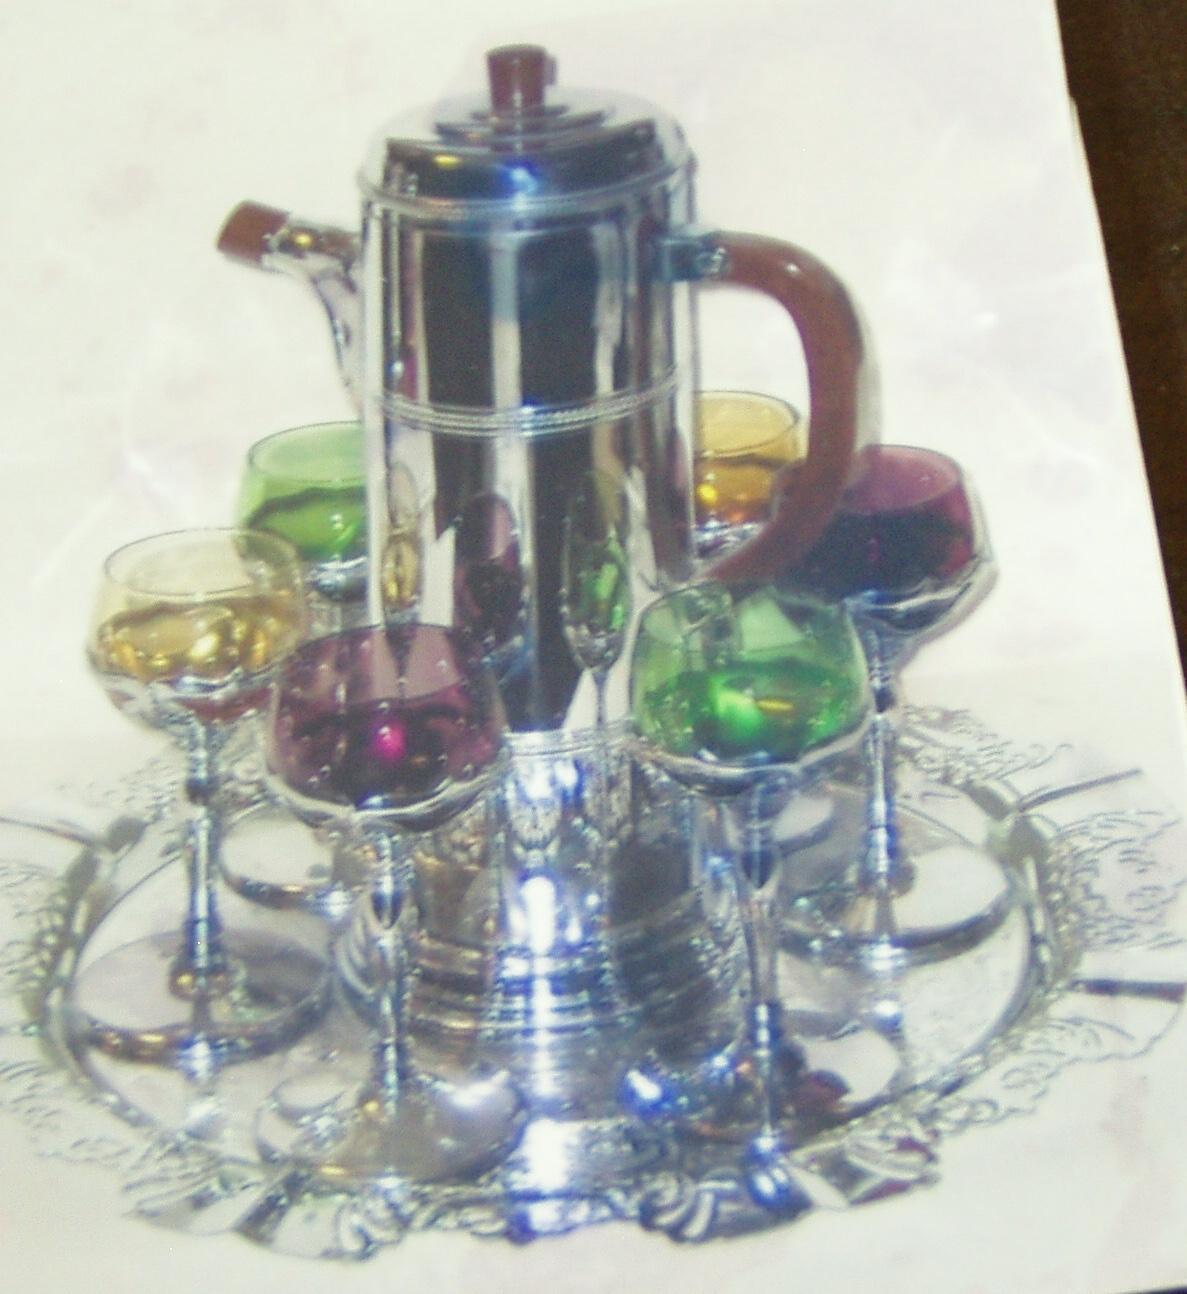 Farber bros krome kraft cocktail set from simplyvintage for Cocktail 102